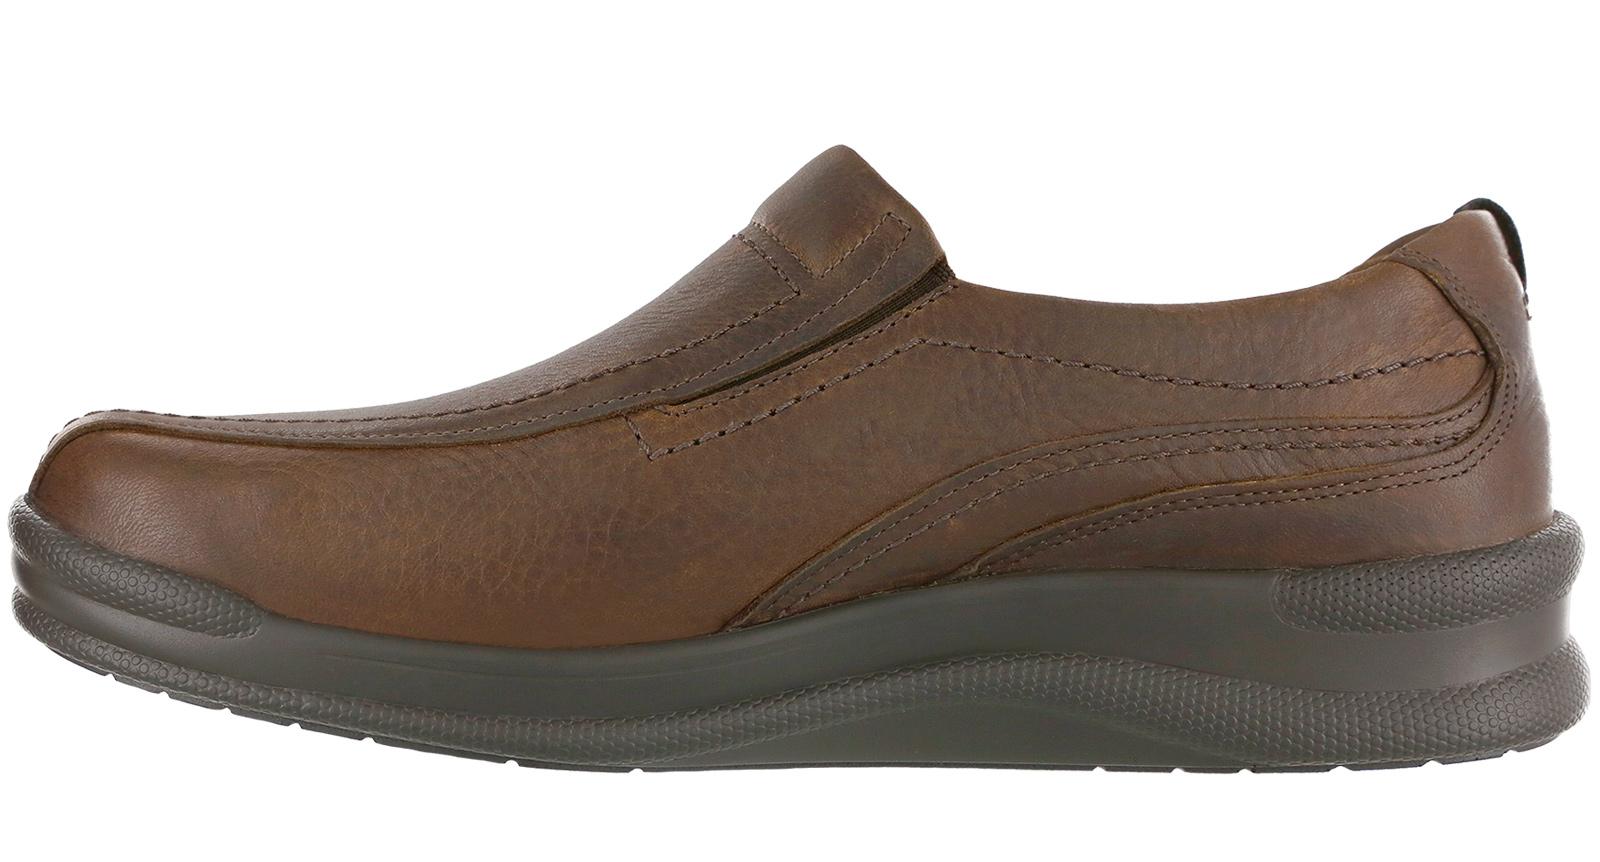 Cruise On - Brown — SAS Shoes Buffalo